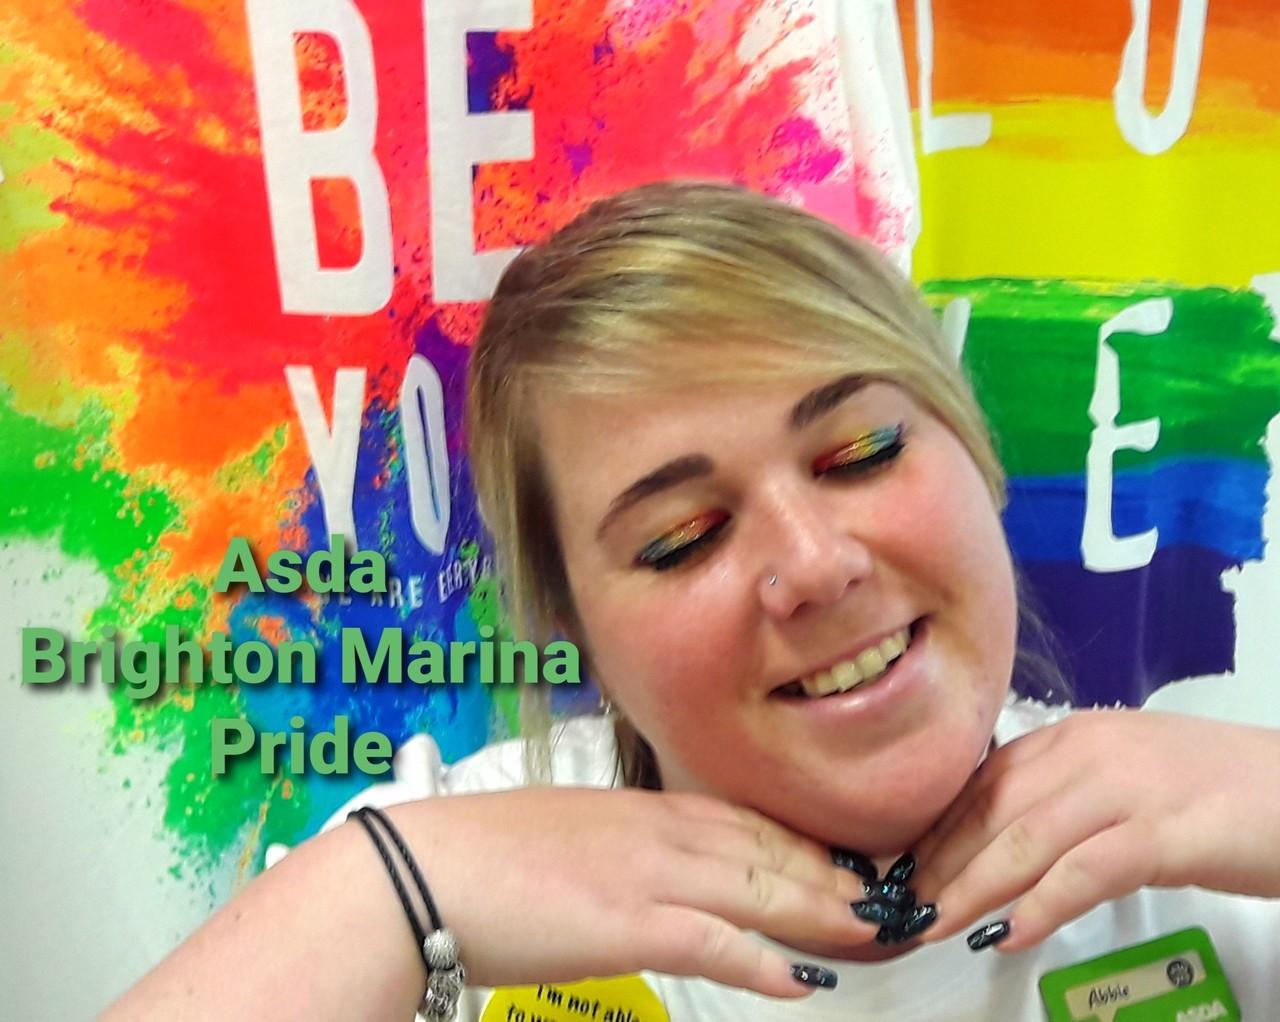 Brighton Marina Pride | Asda Brighton Marina